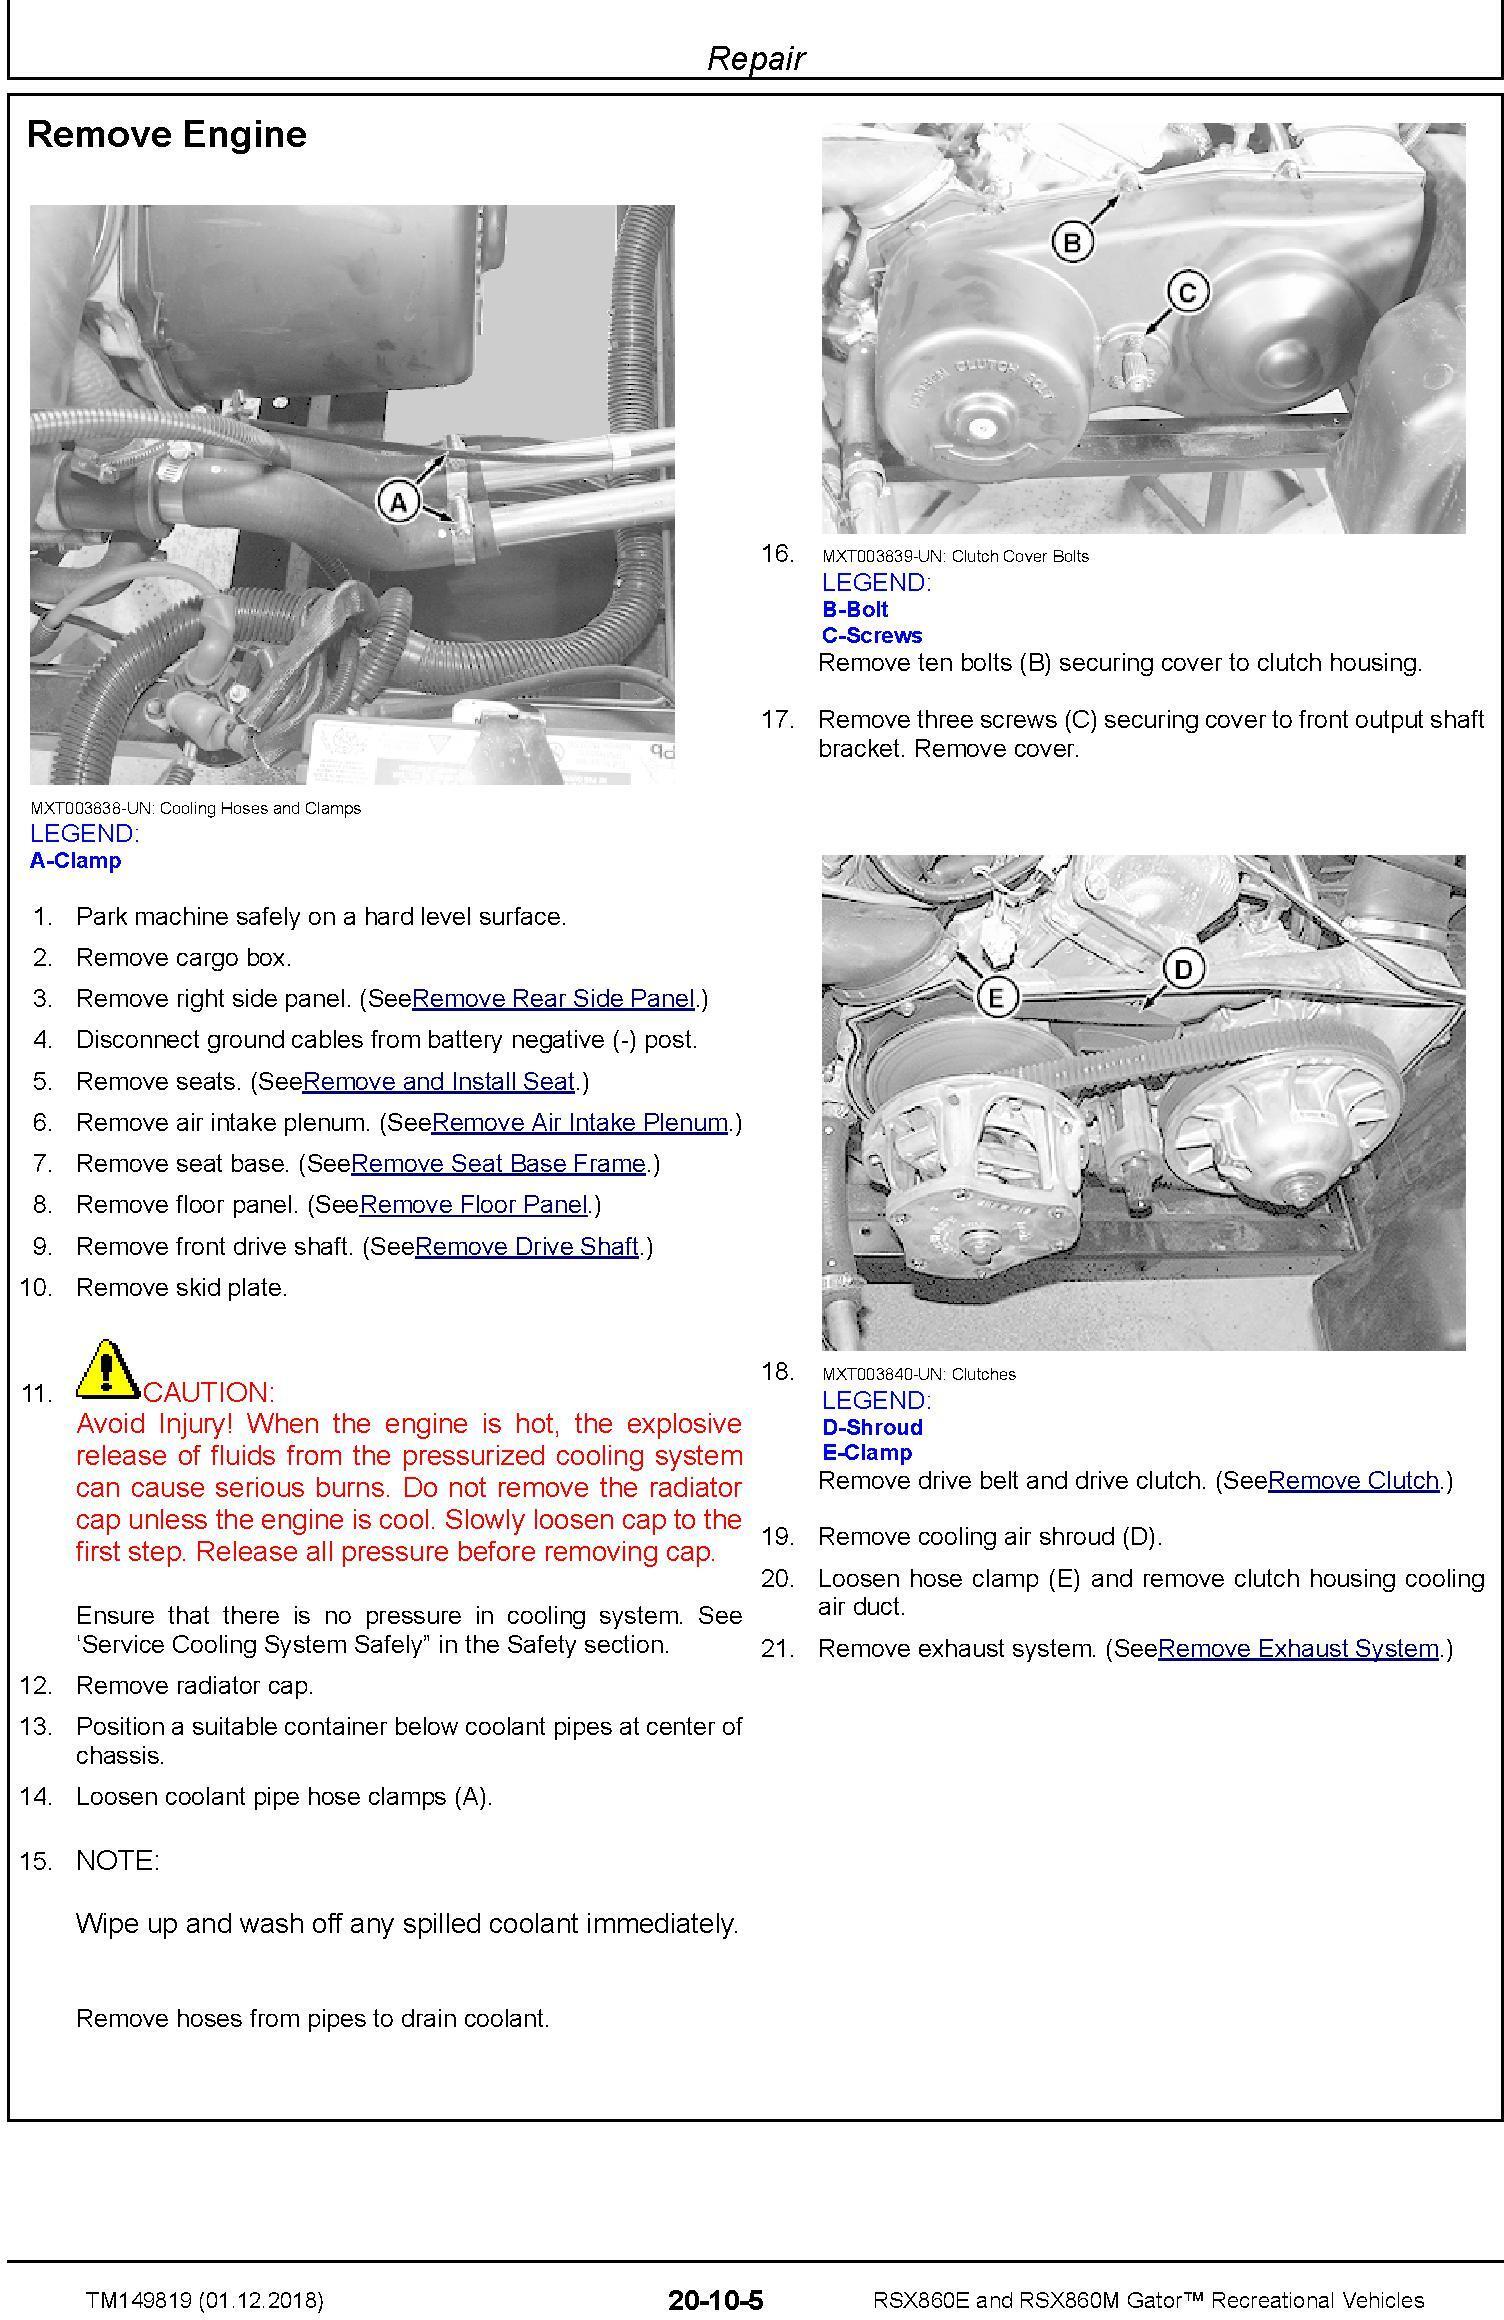 John Deere RSX860E and RSX860M Gator Recreational Vehicles (SN.010001-) Technical Manual (TM149819) - 1